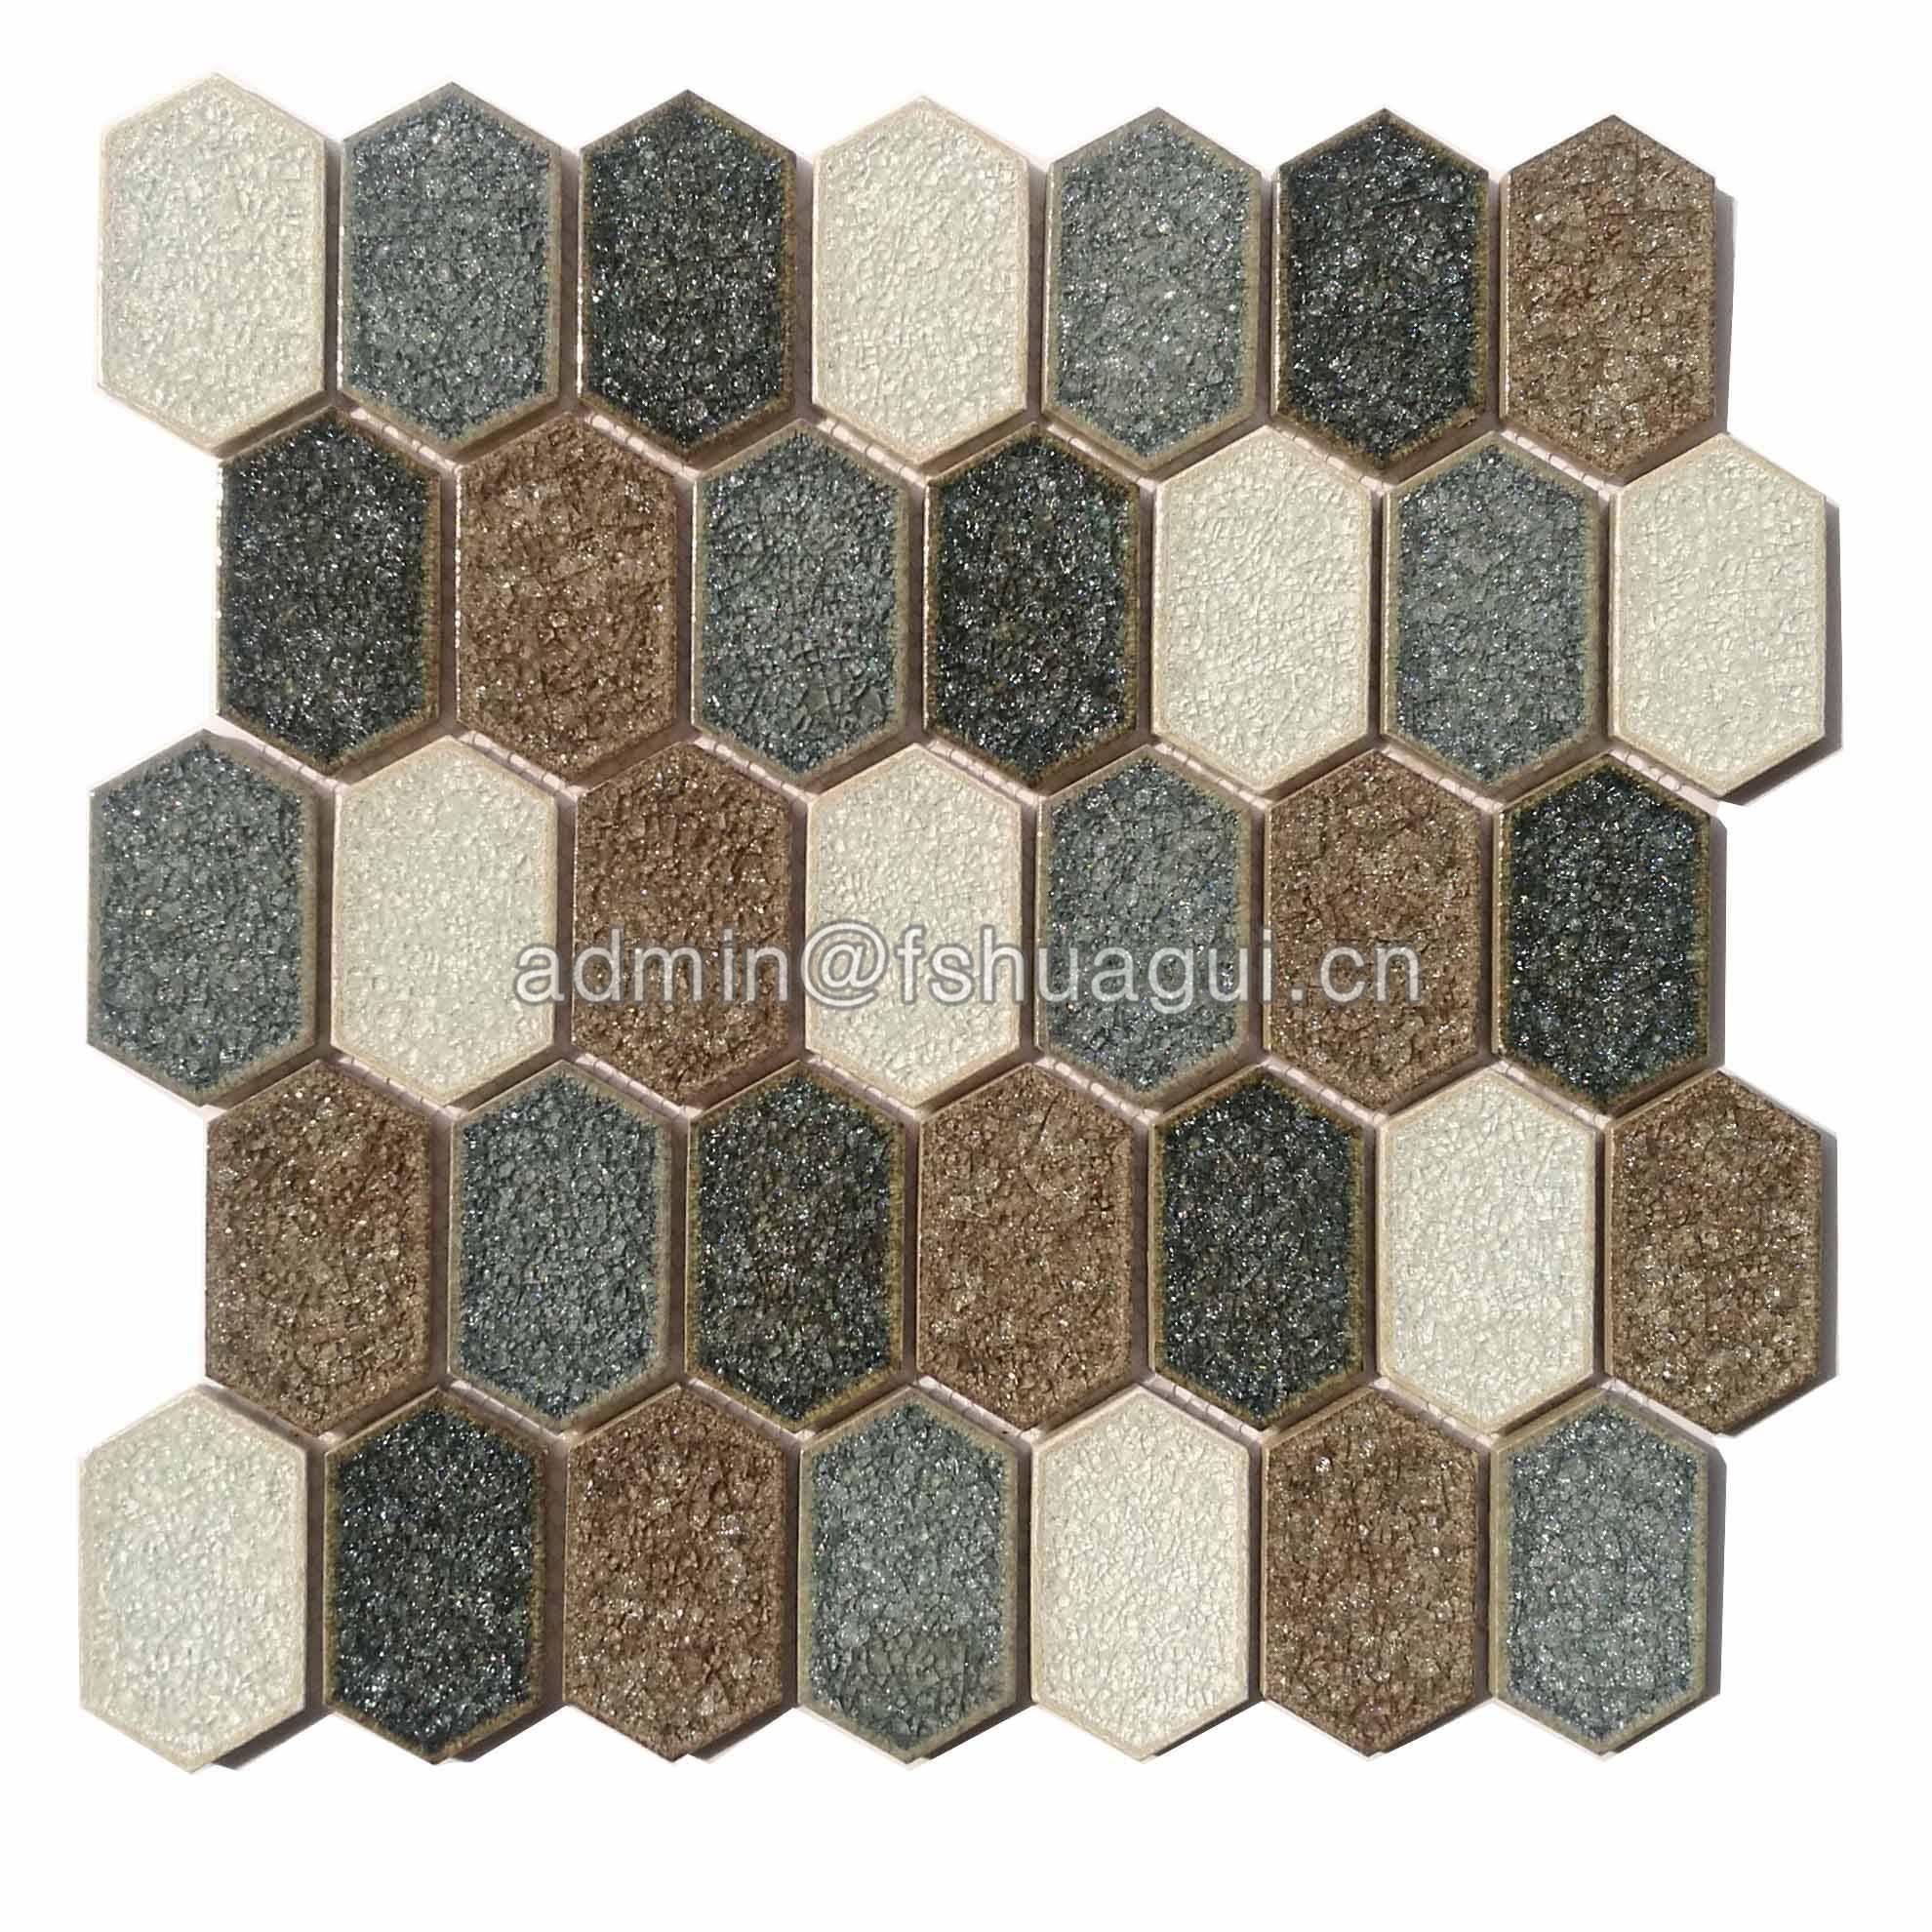 Huagui Ceramic Mosaic Tile HG-IC010 CERAMIC MOSAIC TILE image5